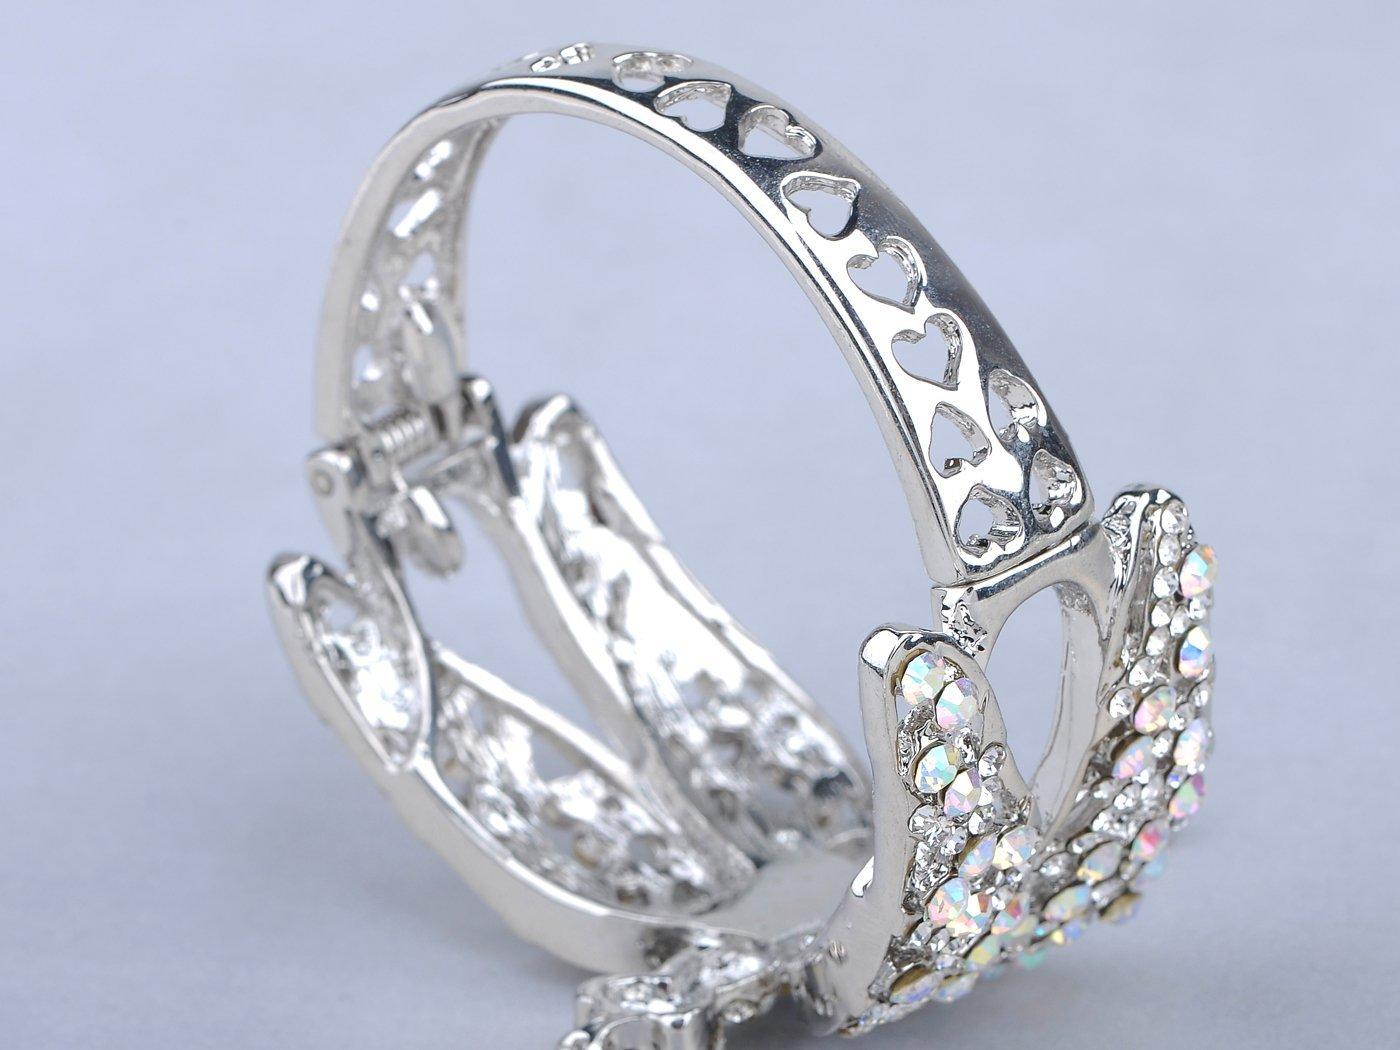 Alilang Womens Silvery Tone Clear Rhinestones Dragonfly Heart Cutout Bangle Bracelet by Alilang (Image #5)